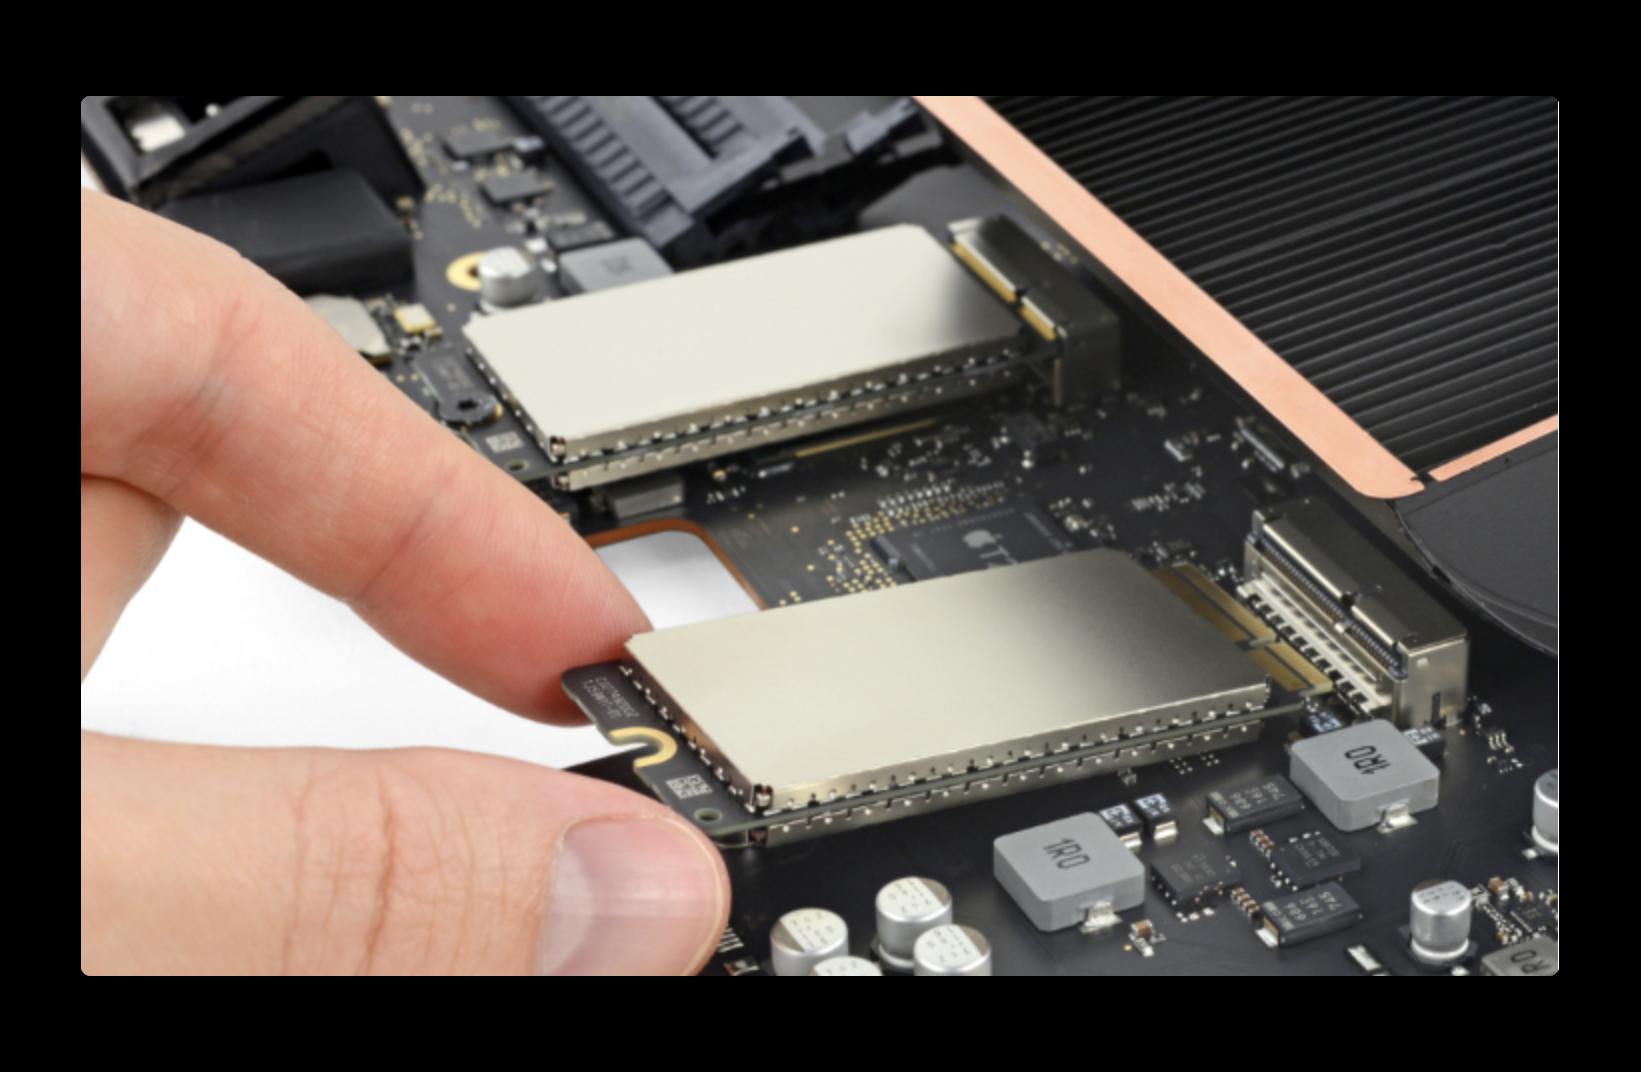 Bare Feats、iMac Pro PCIeベースのフラッシュストレージを他のMacと比較